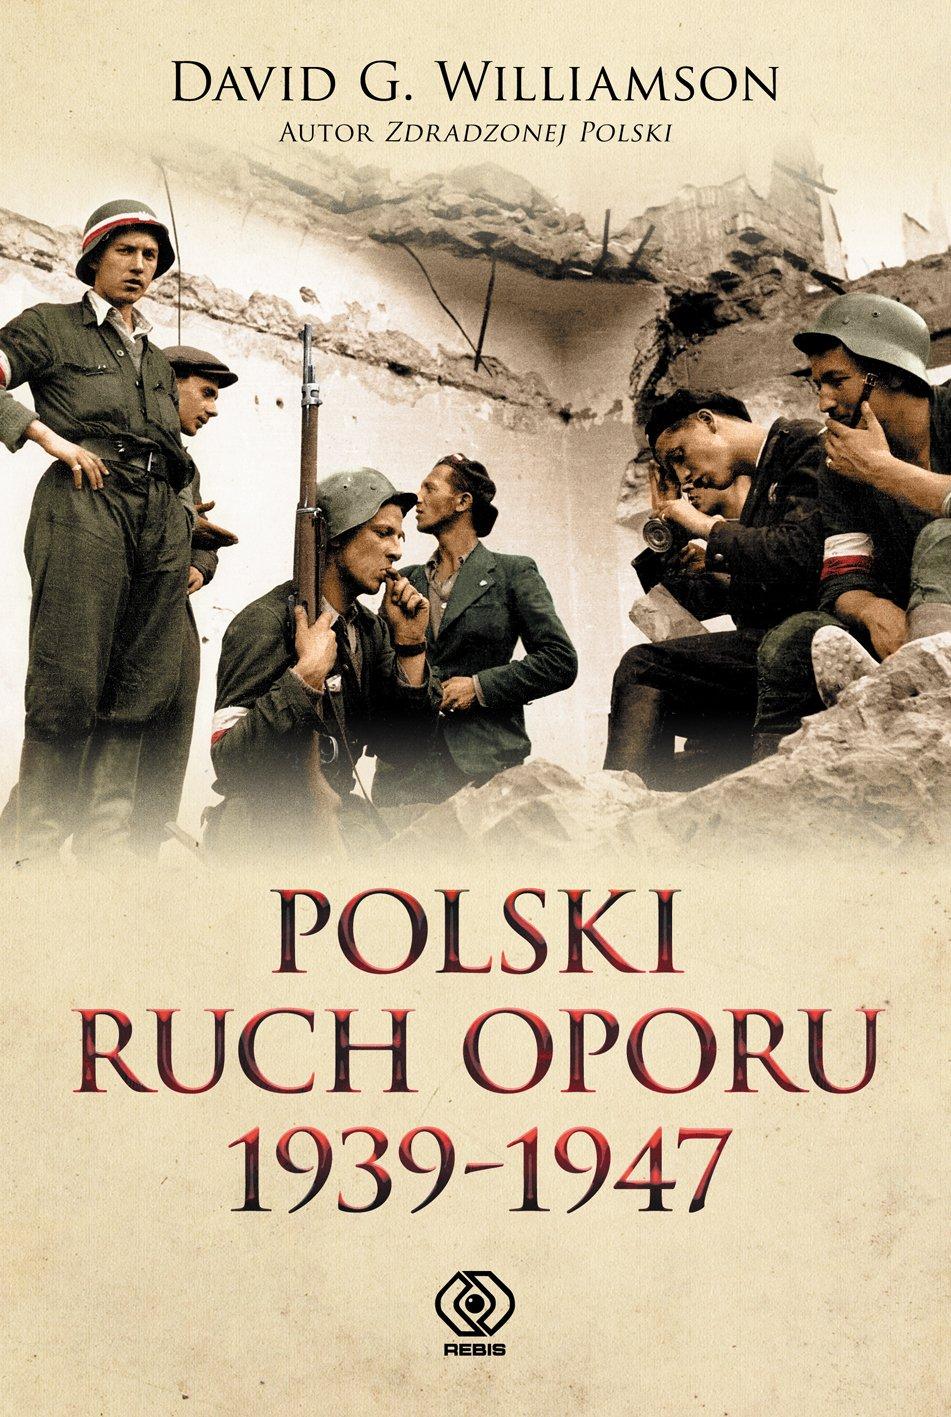 Polski ruch oporu 1939-1947 - Ebook (Książka na Kindle) do pobrania w formacie MOBI